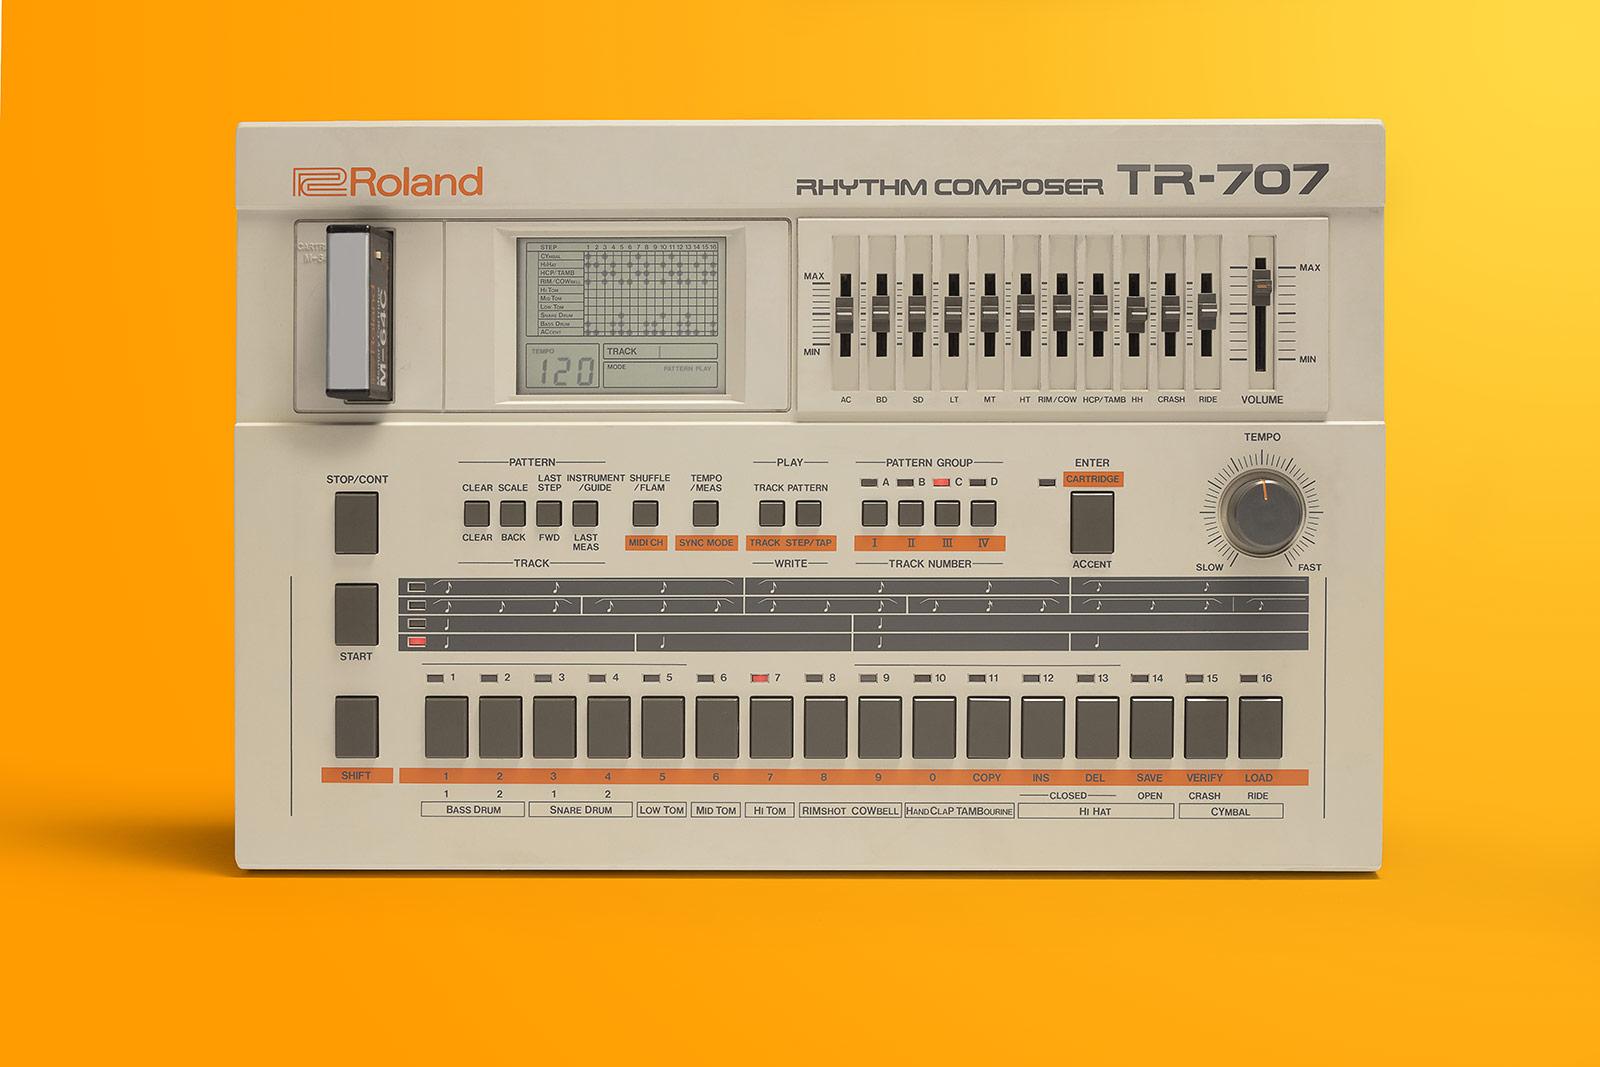 TR-707 Rhythm Composer